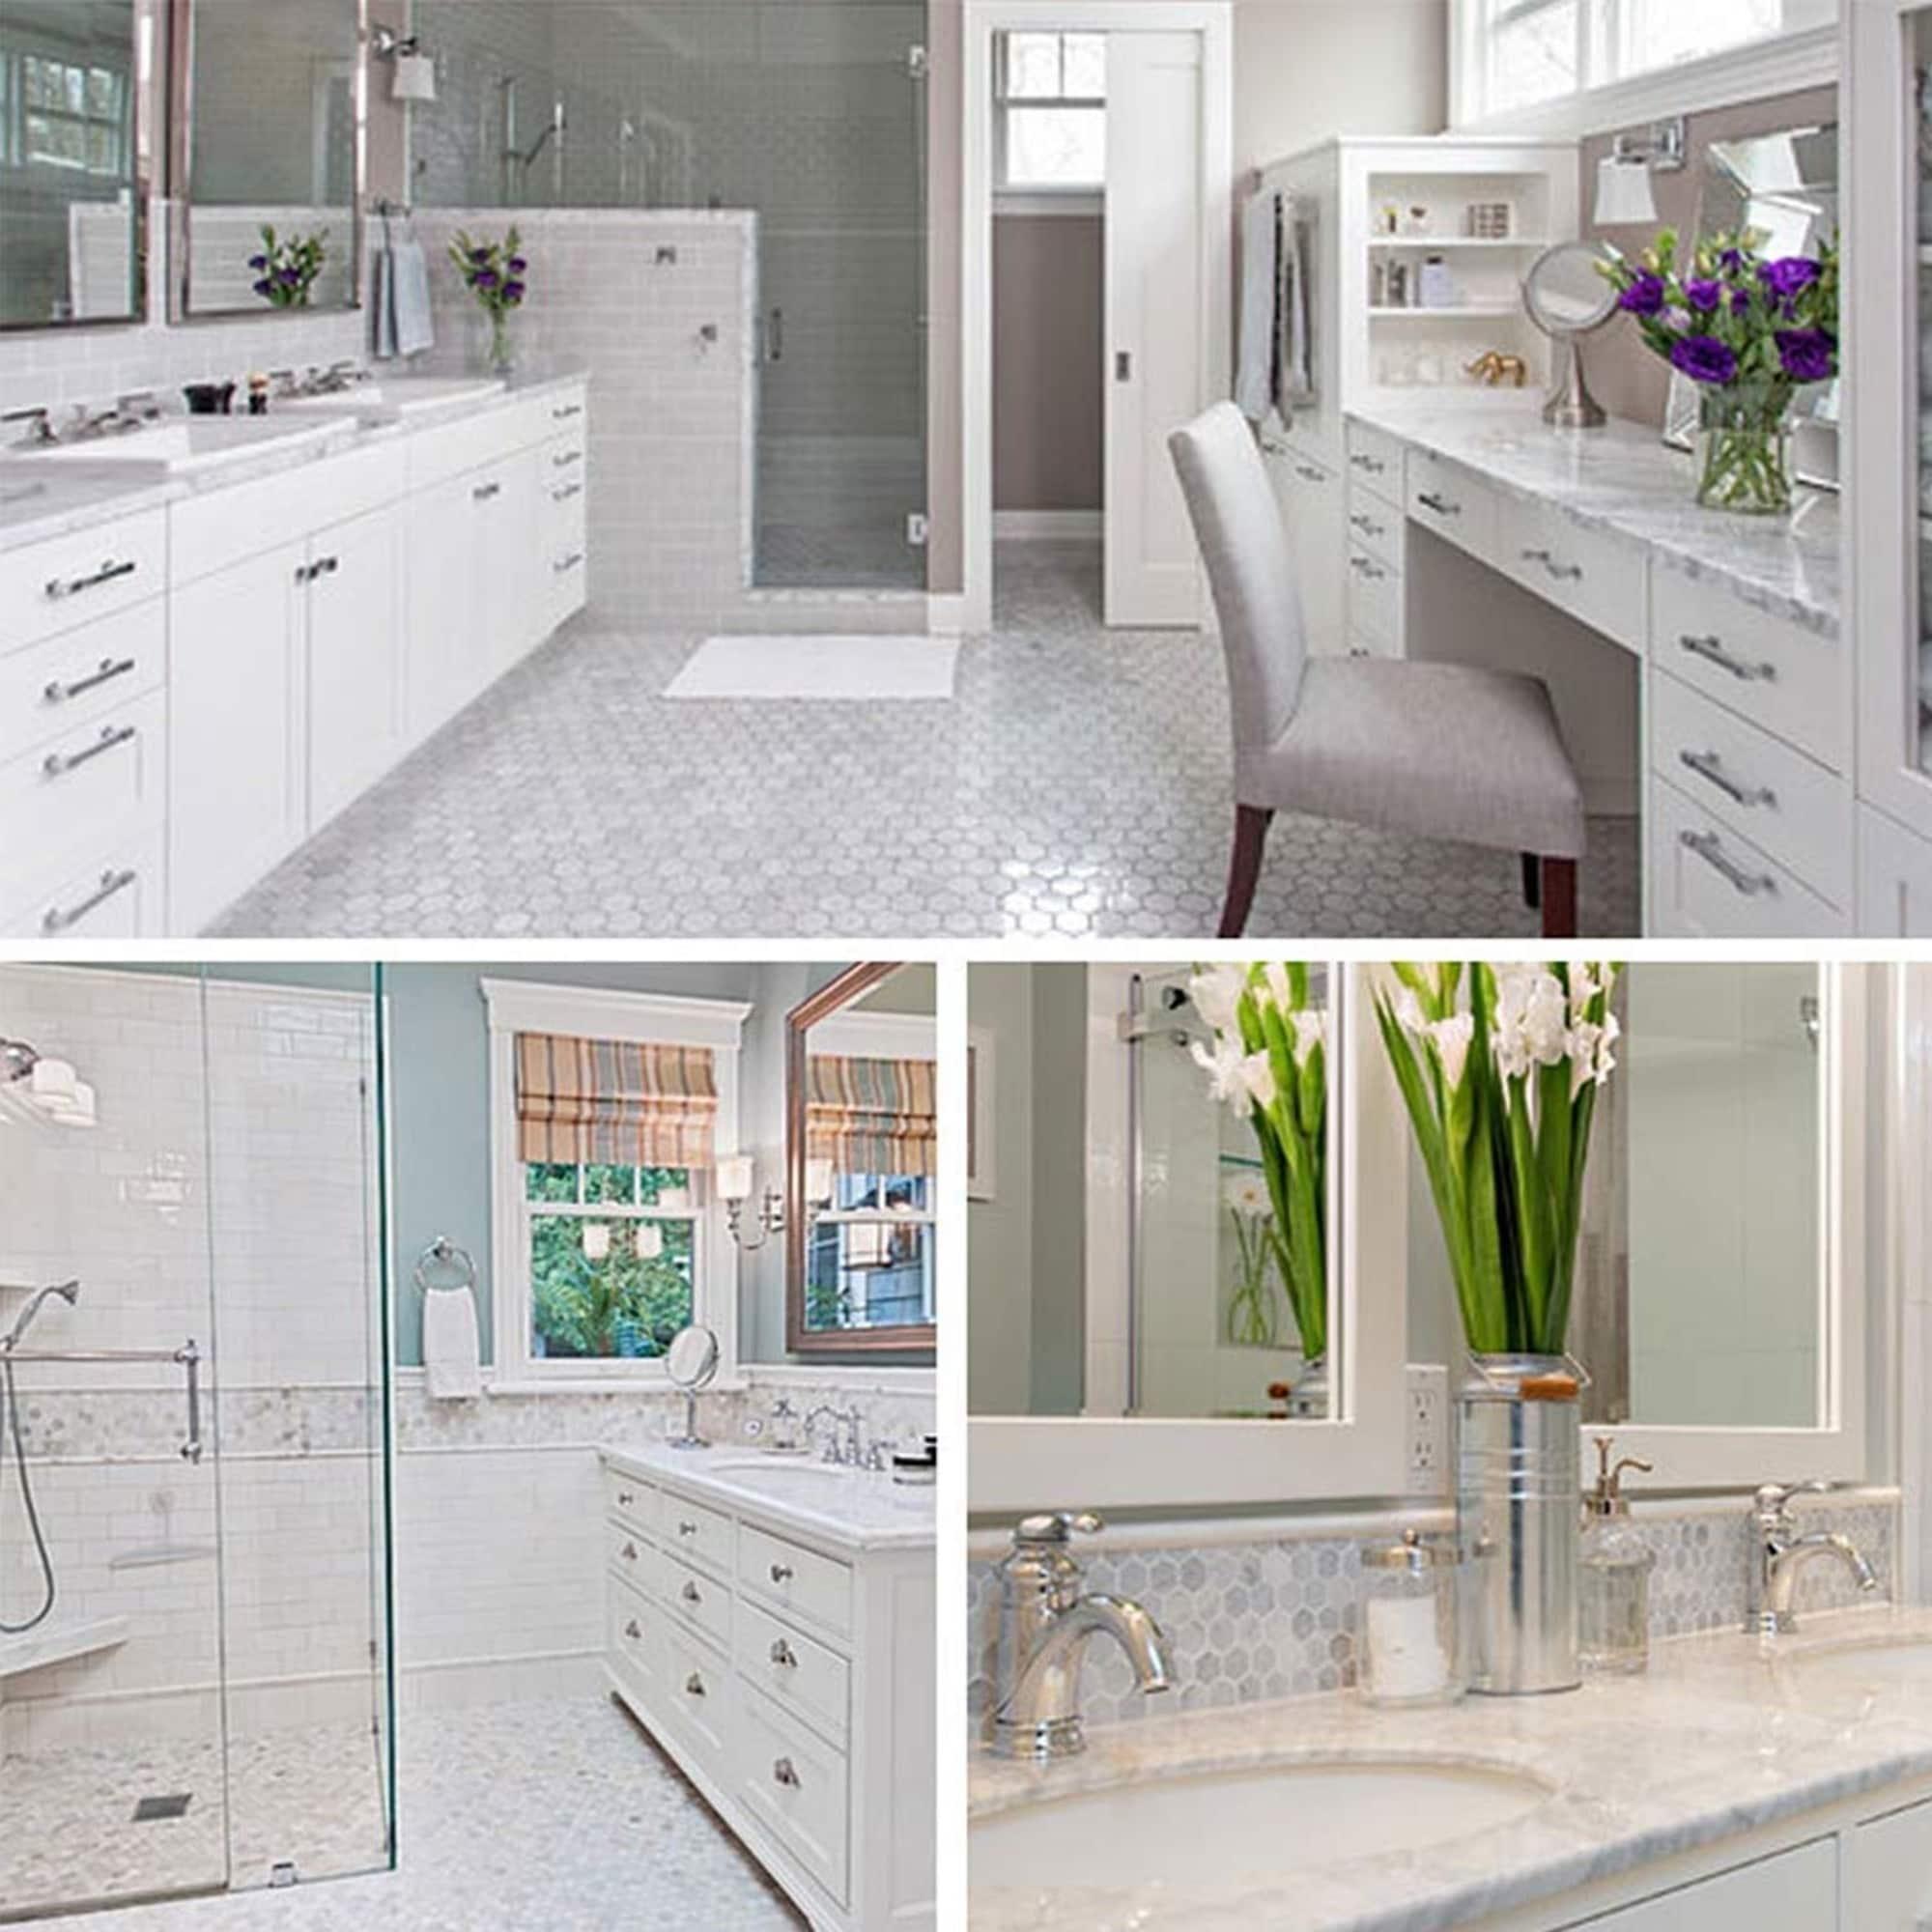 Carrara Marble Mosaic Decorative Backsplash Tile 12 X 12 X 0 38 Pc On Sale Overstock 30865919